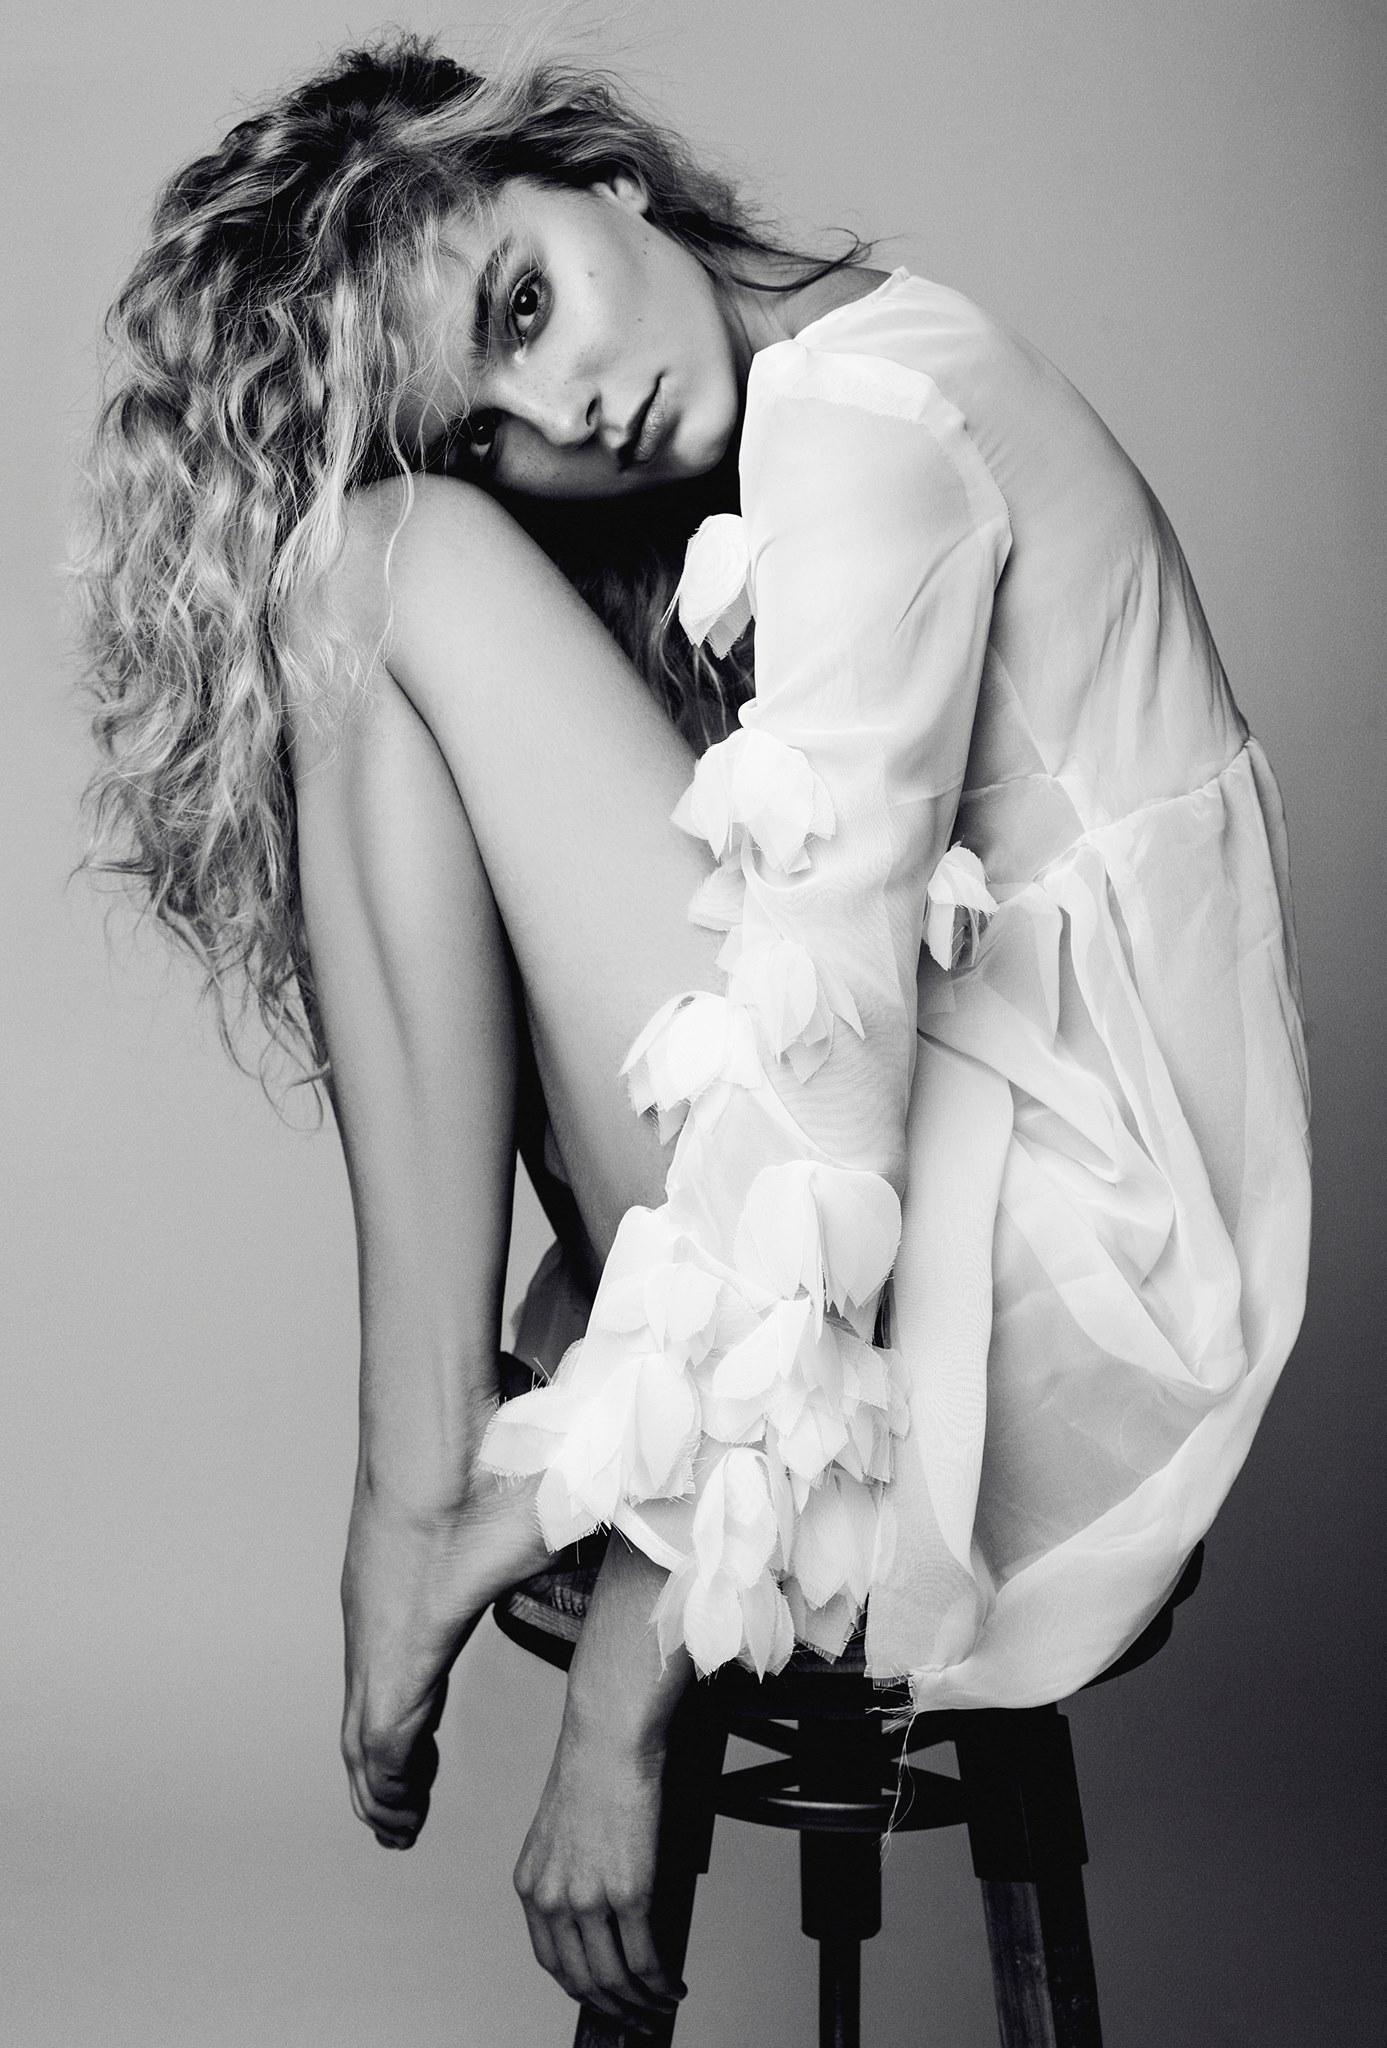 Amélie Tremblay international top model from Quebec, photographer Dariane Sanche